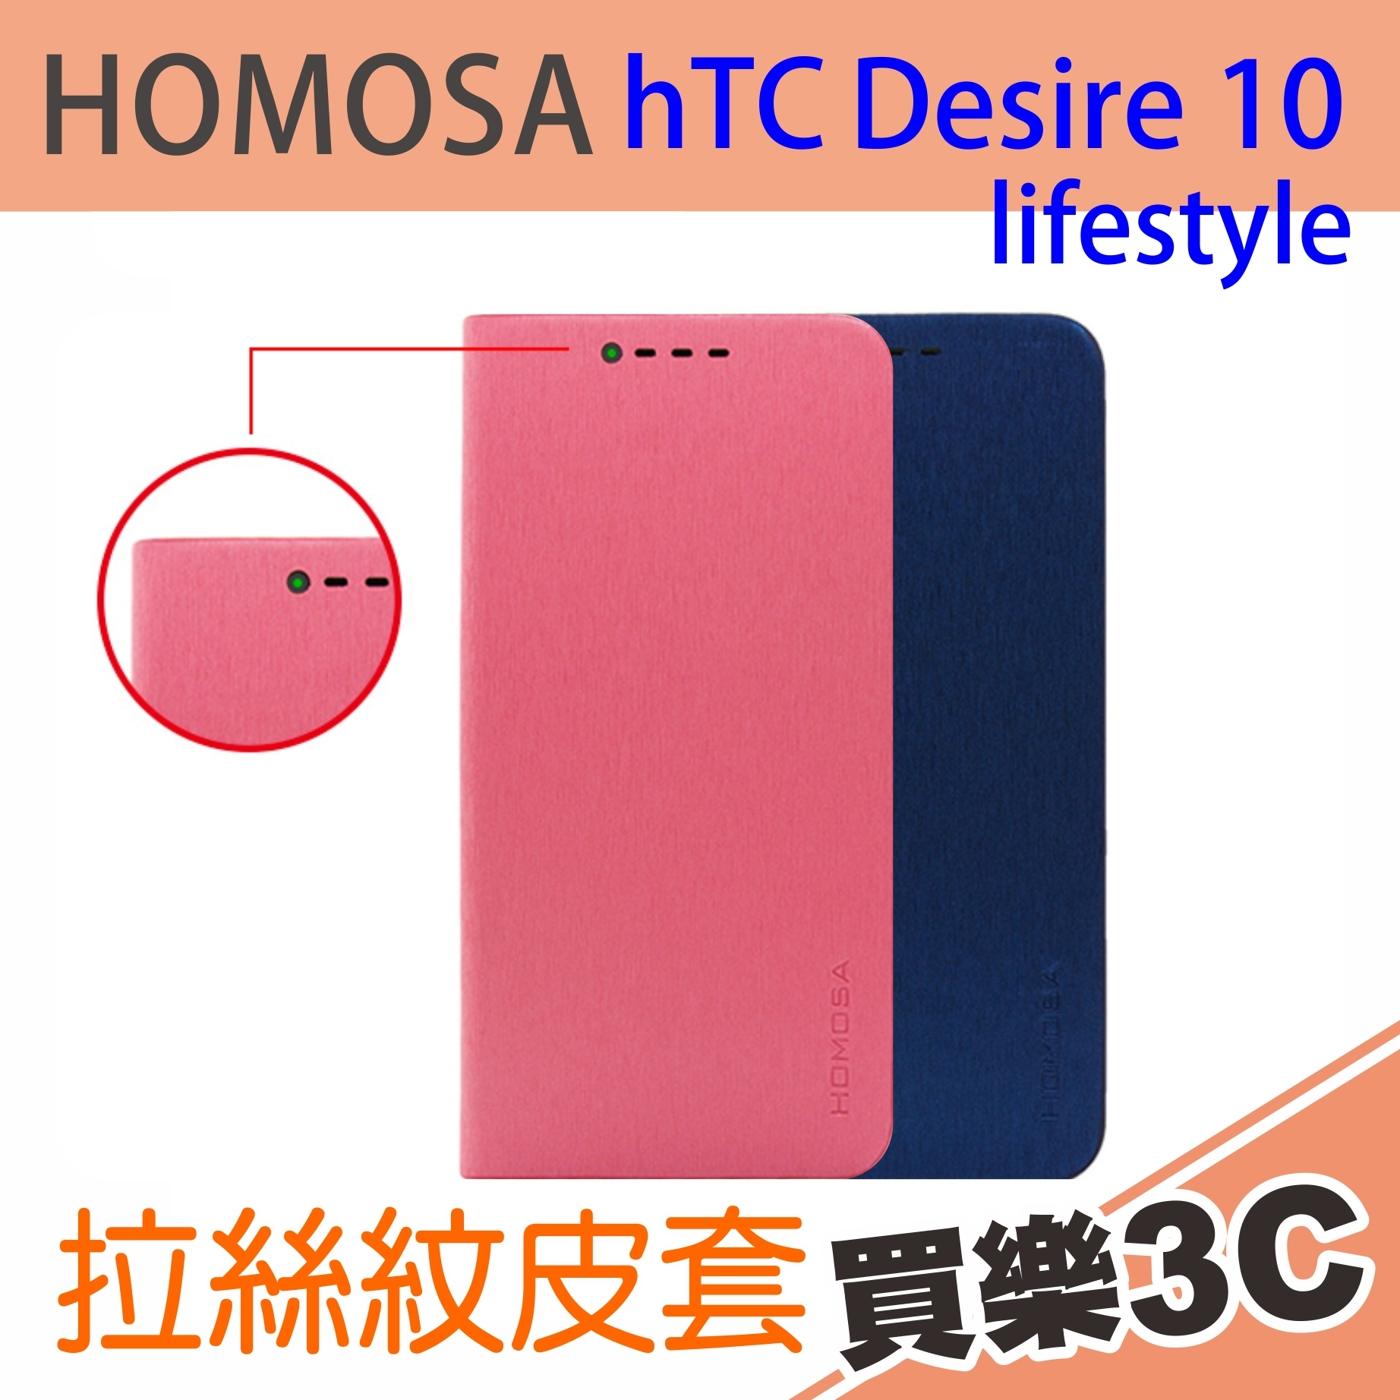 HOMOSA HTC Desire 10 lifestyle手機專用拉絲紋側掀皮套系列送保護貼分期0利率